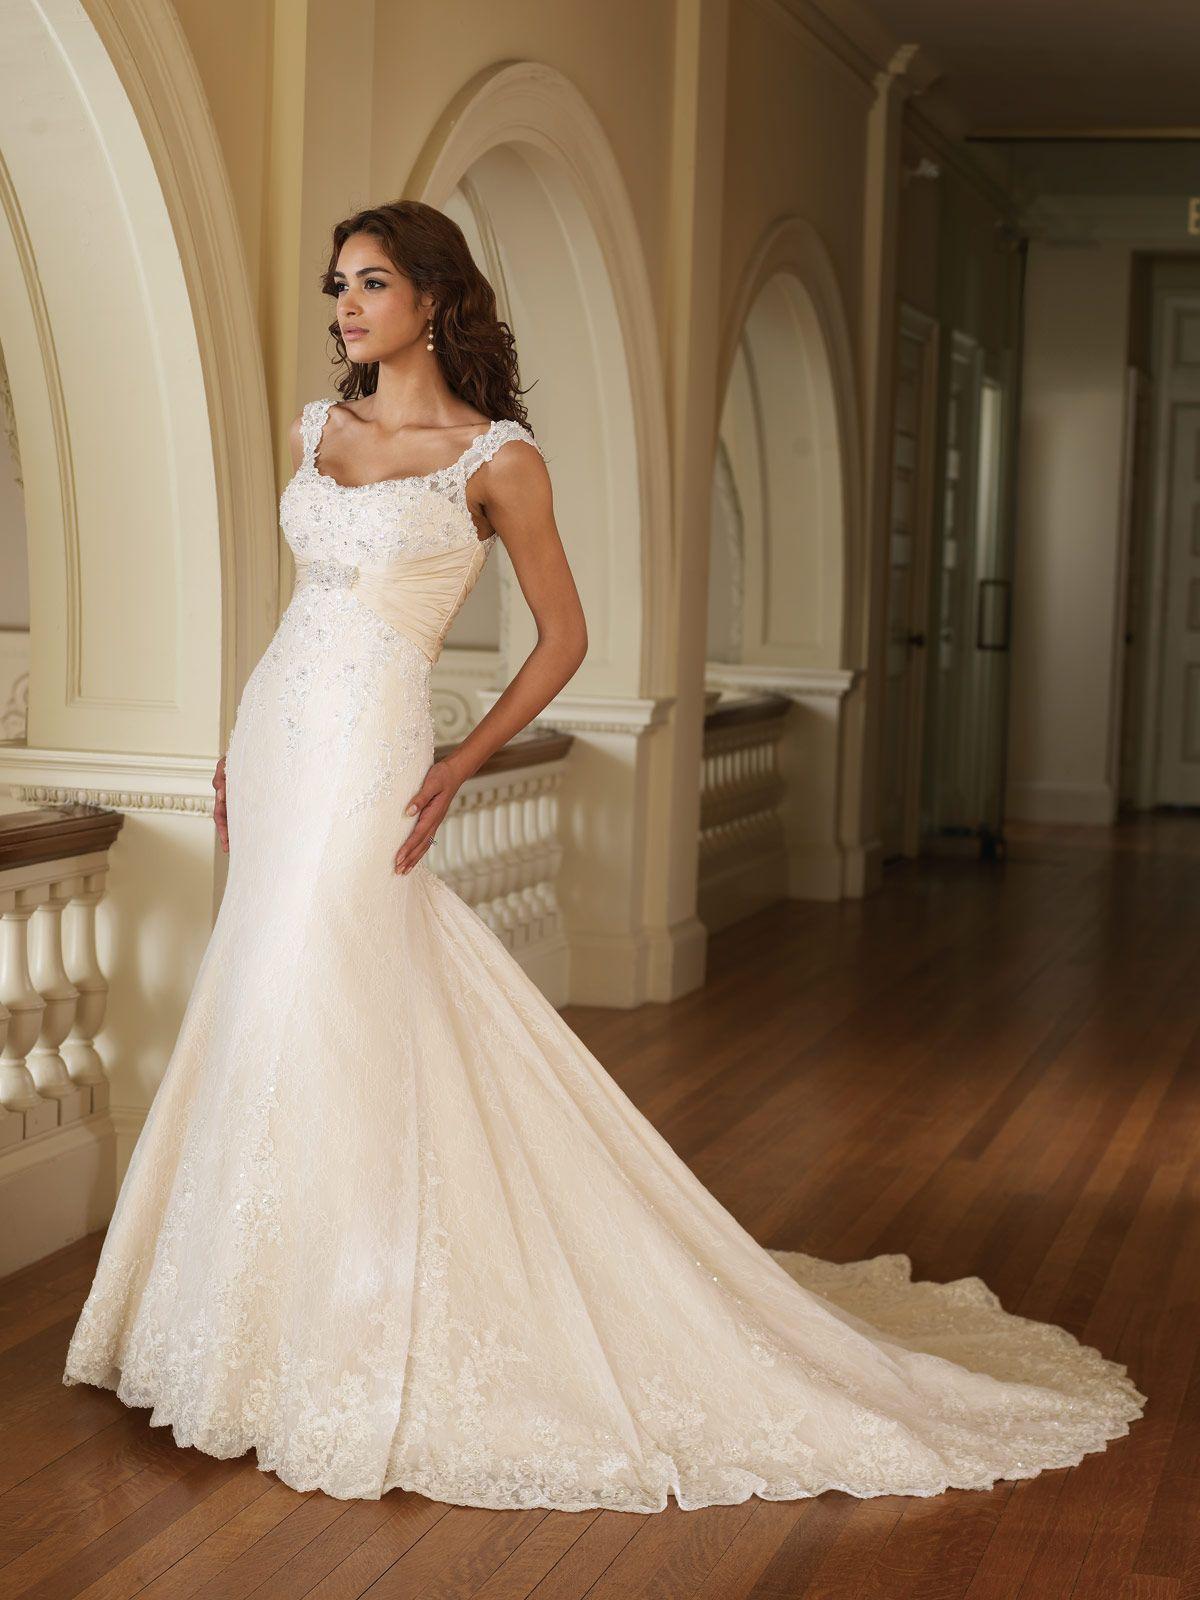 Sophia tolli wedding dresses for mon cheri david tutera